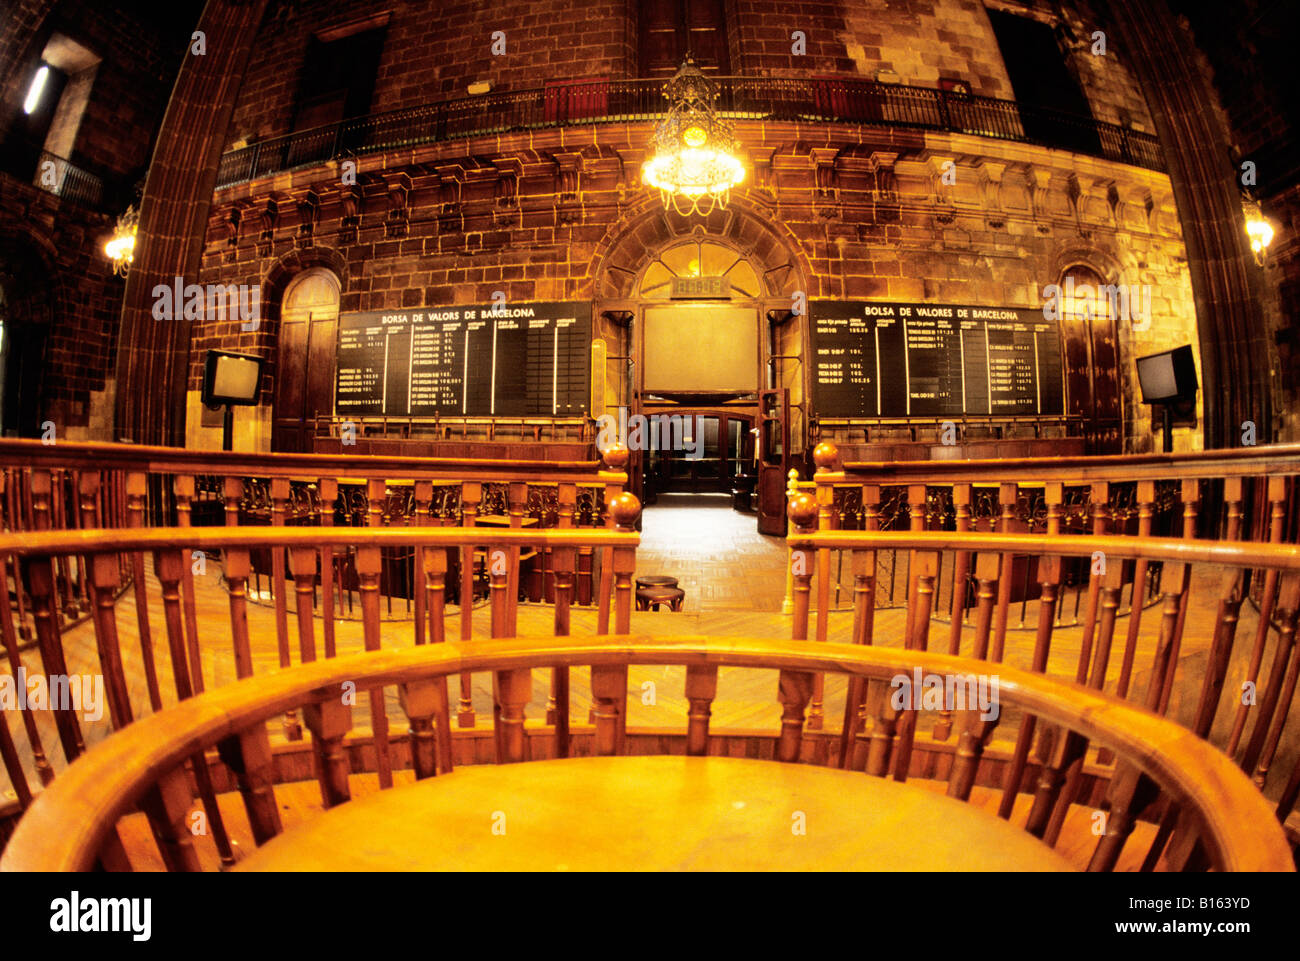 Europe Spain Barcelona La Llotja Palace of Barcelona Old Stock Exchange - Stock Image